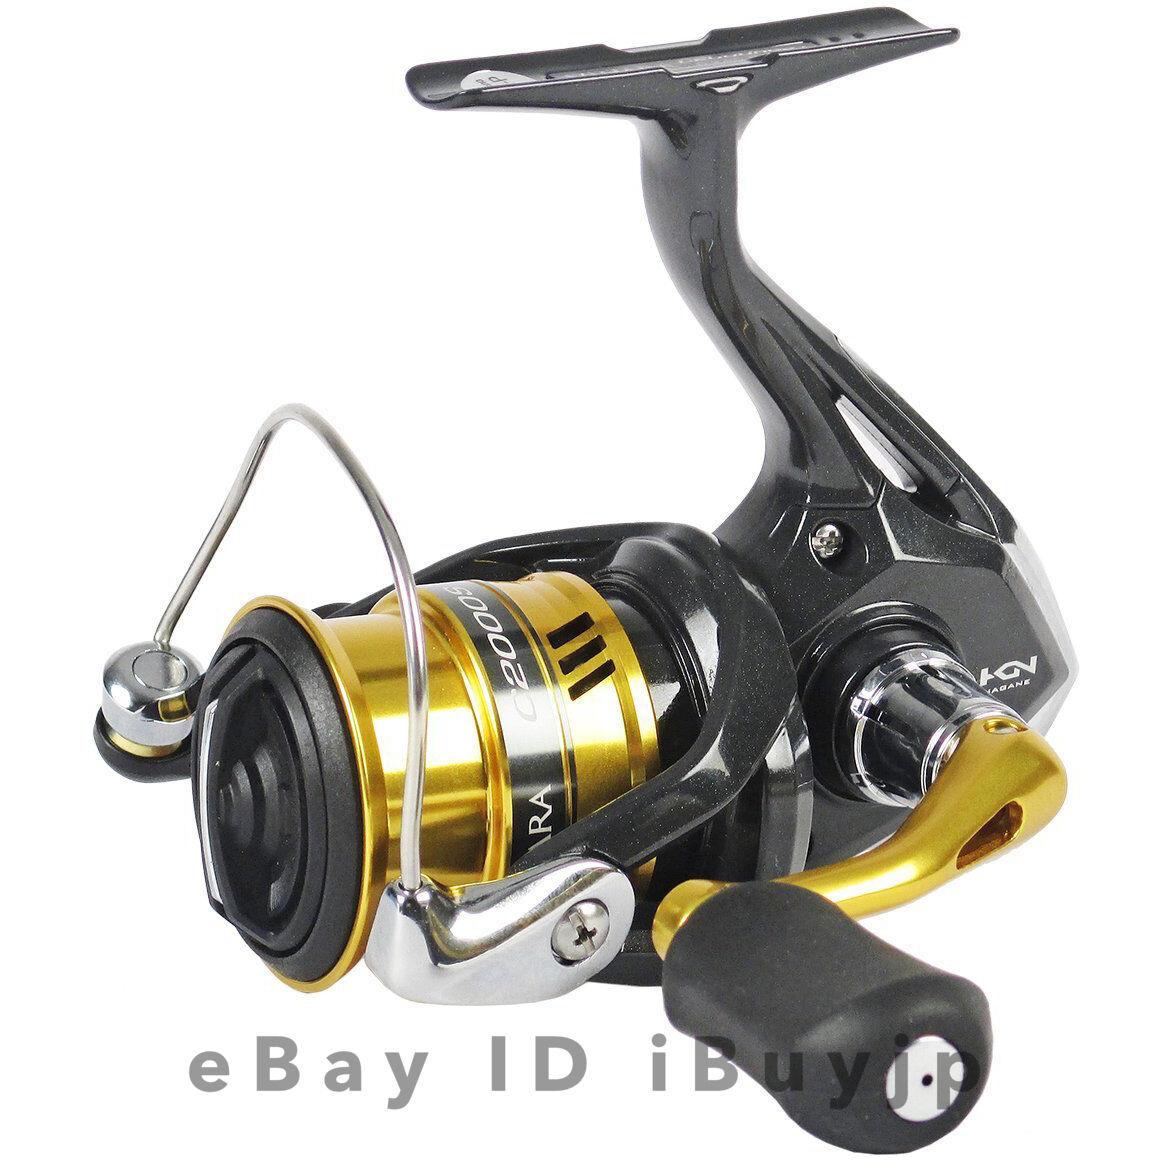 a36659db1dcd Shimano Fishing Reel 17 Sahara C2000hgs for sale online